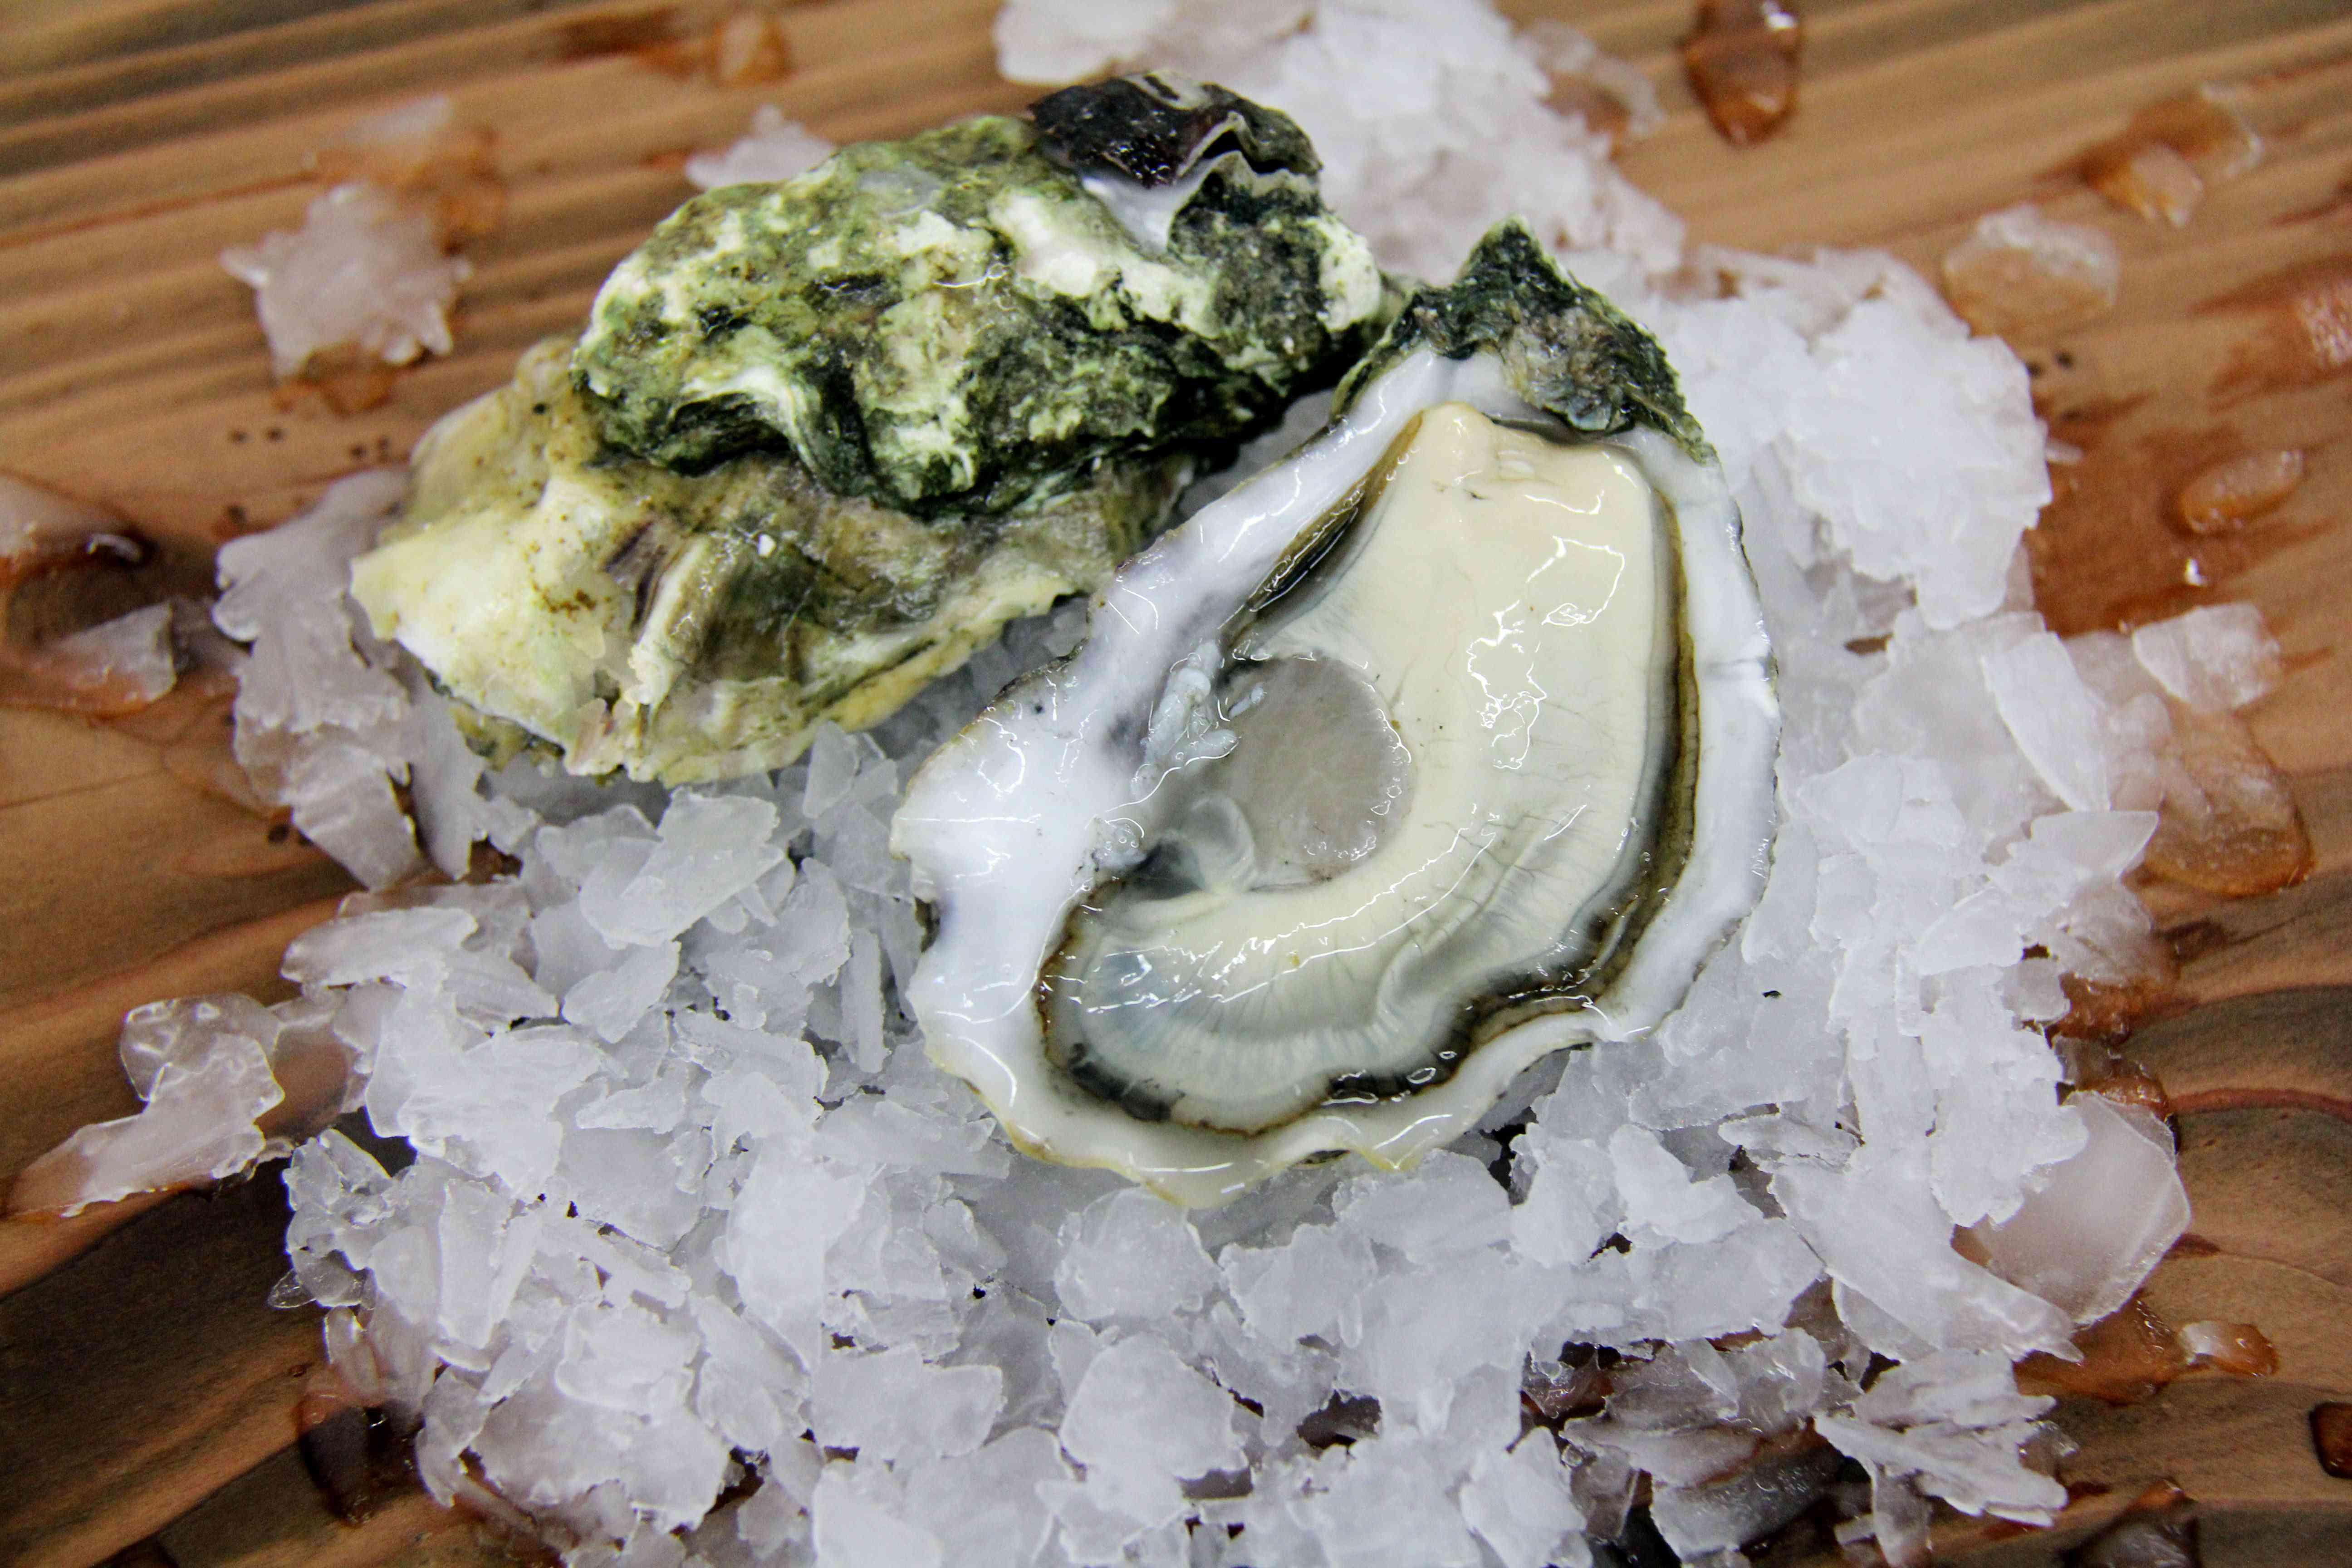 Oriana Poindexter_Catalina Oysters